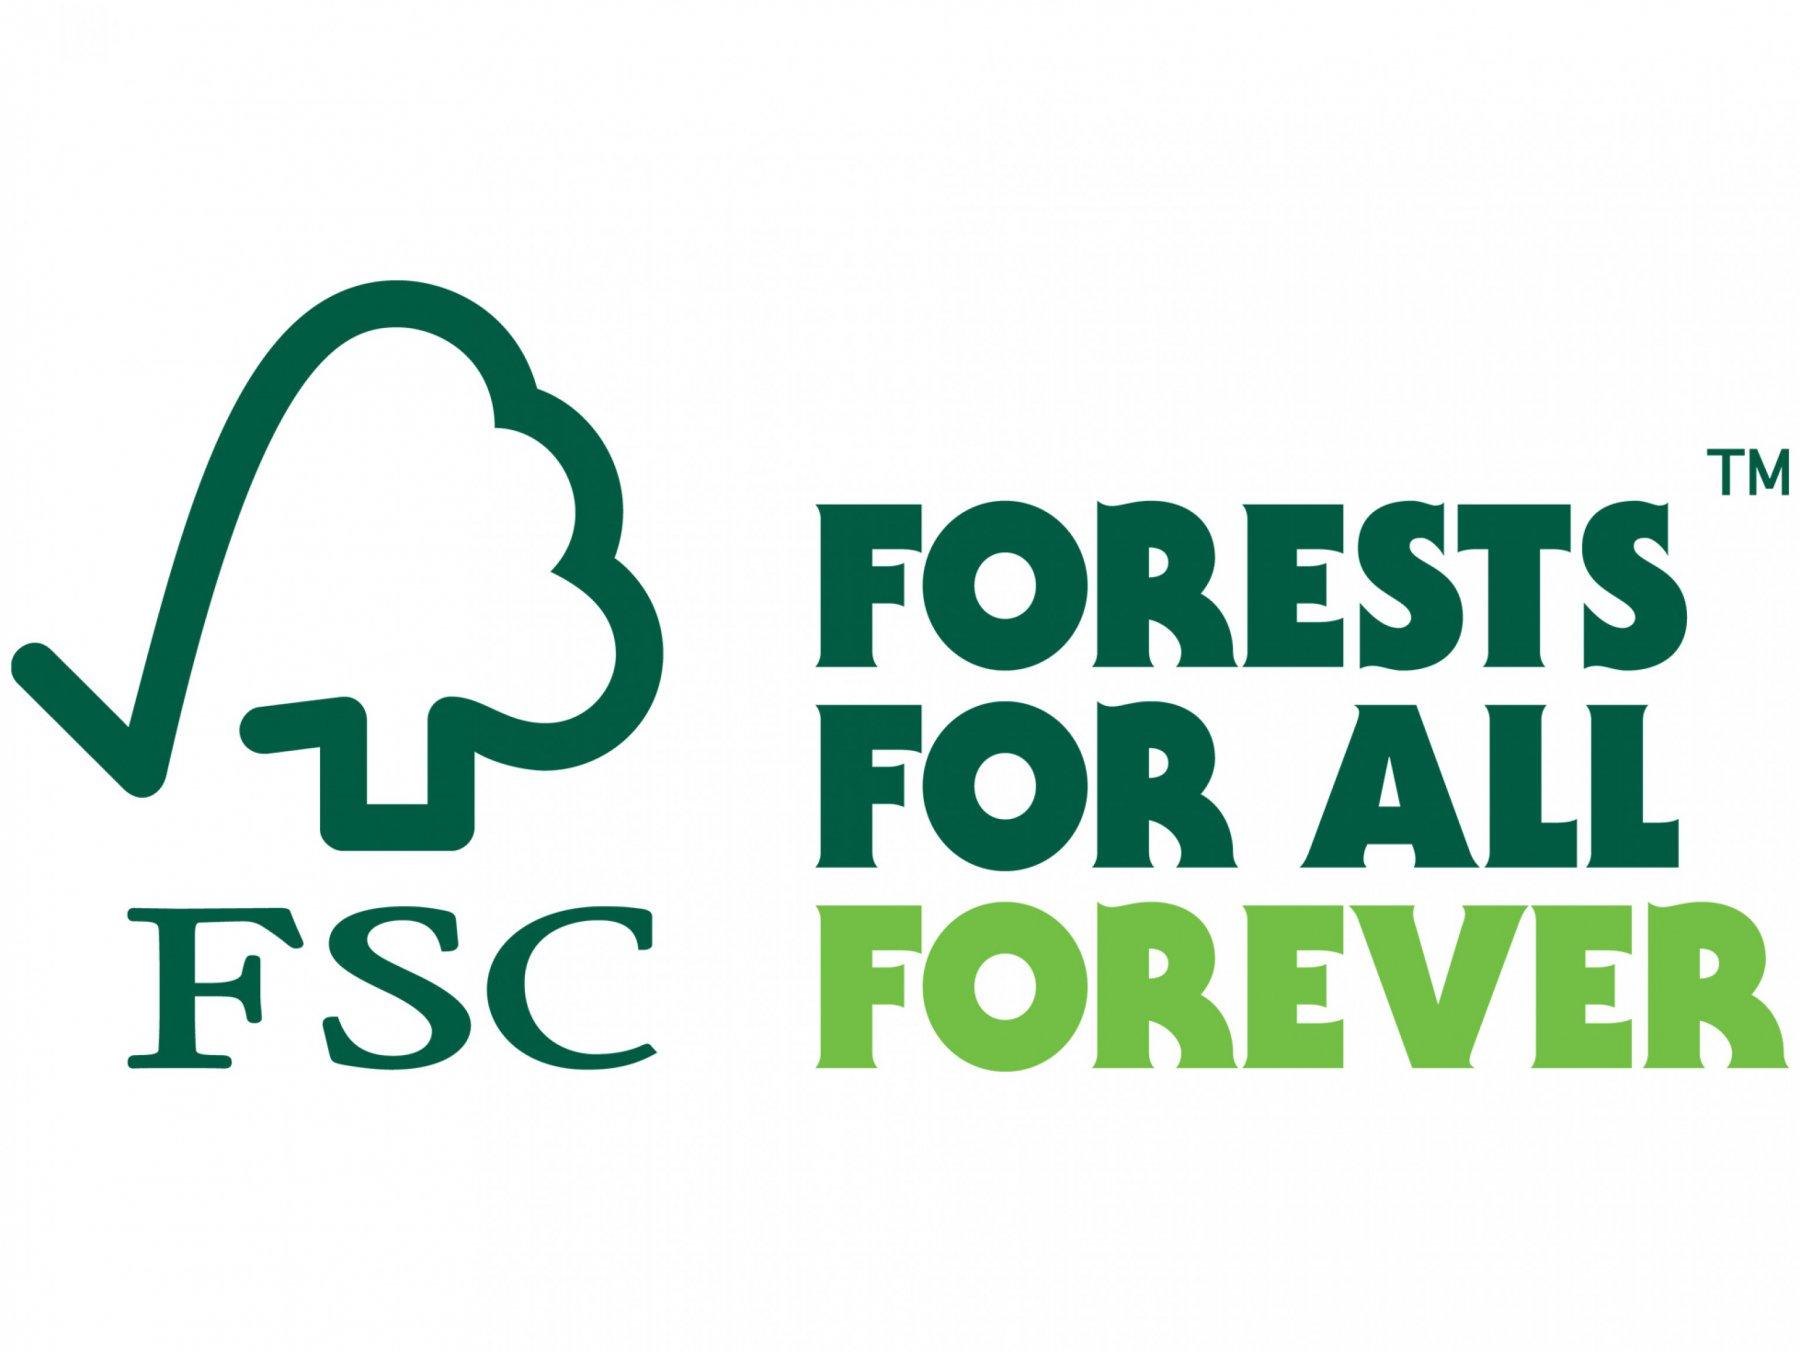 FSC Forest For All Forever